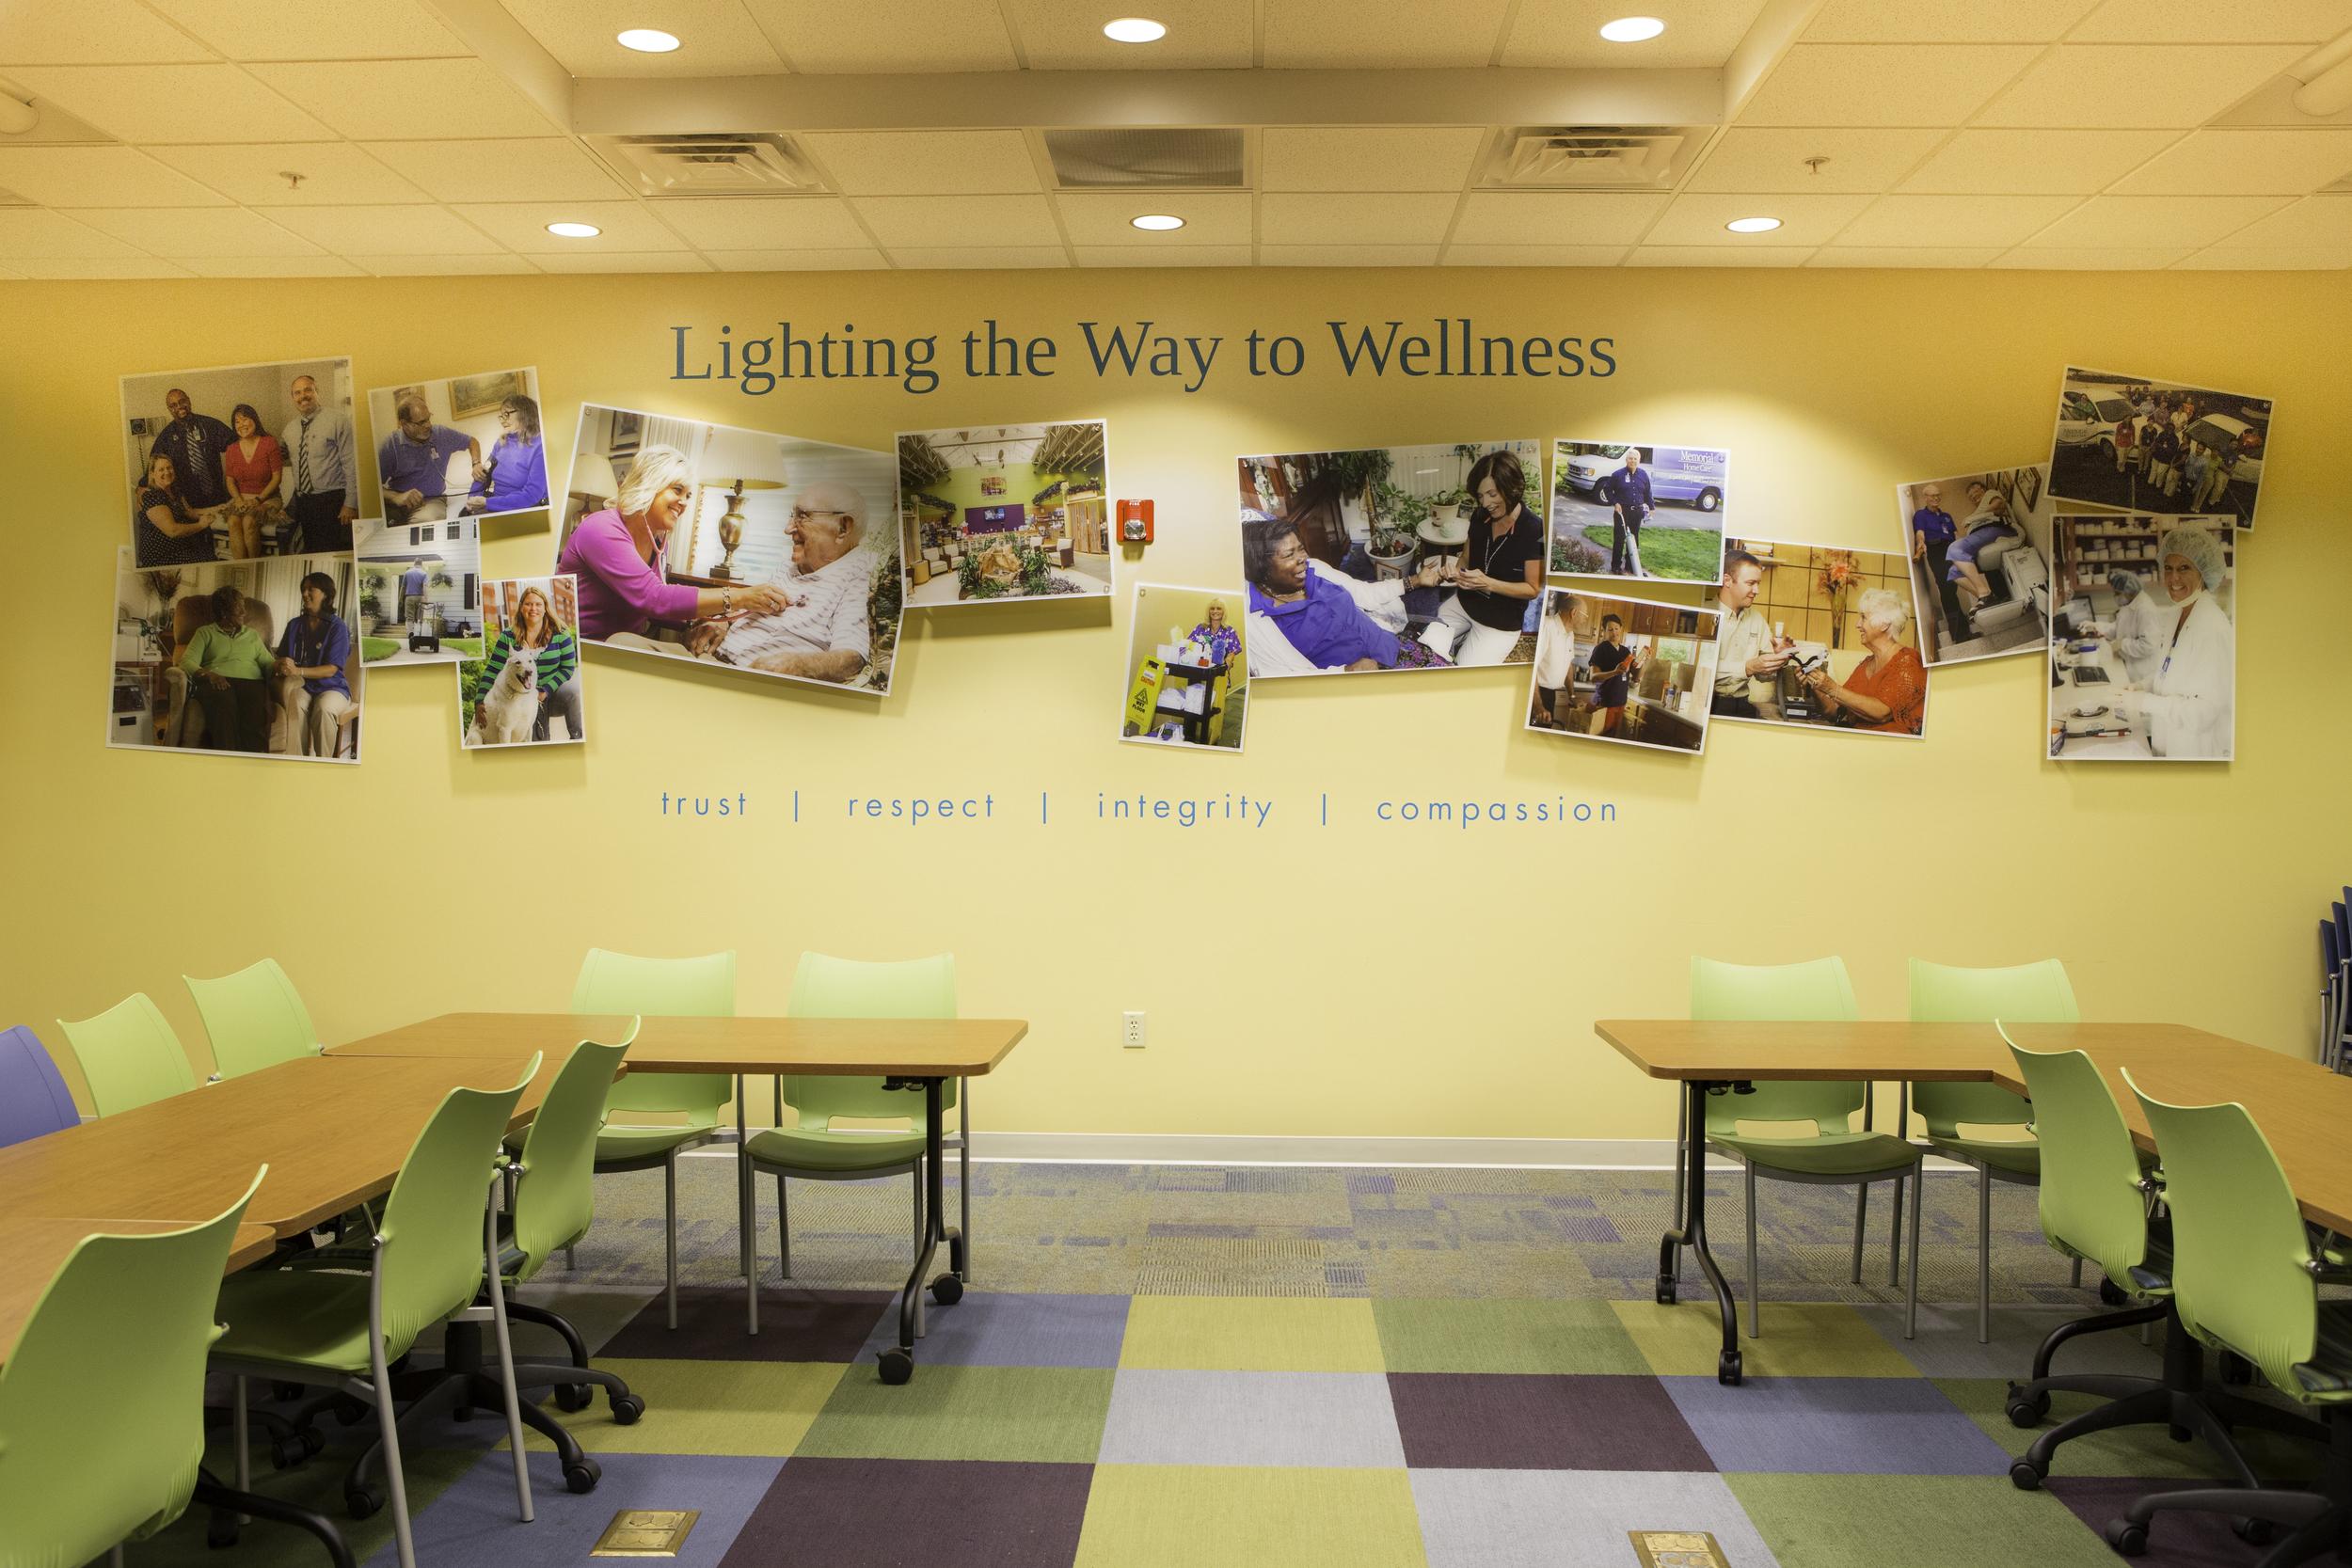 Healthcare Training Room